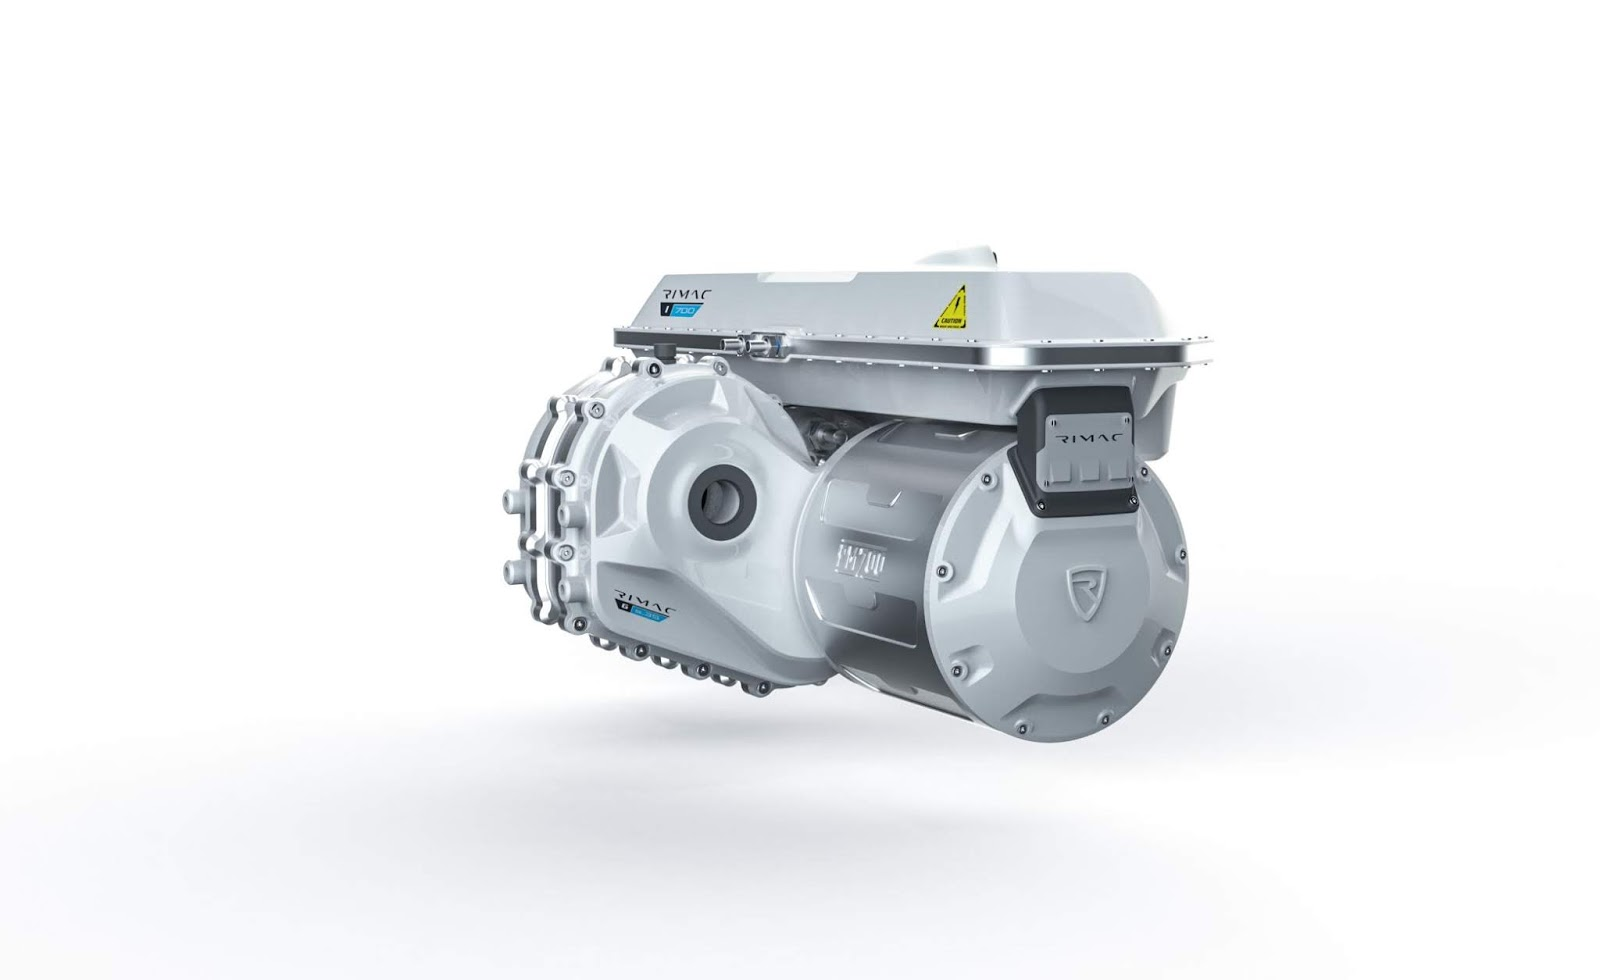 c two rear motors Rimac C Two. Η νέα φυλή στα hypercars, έρχεται με 1900 ίππους. C Two, Electric cars, hypercar, Rimac, zblog